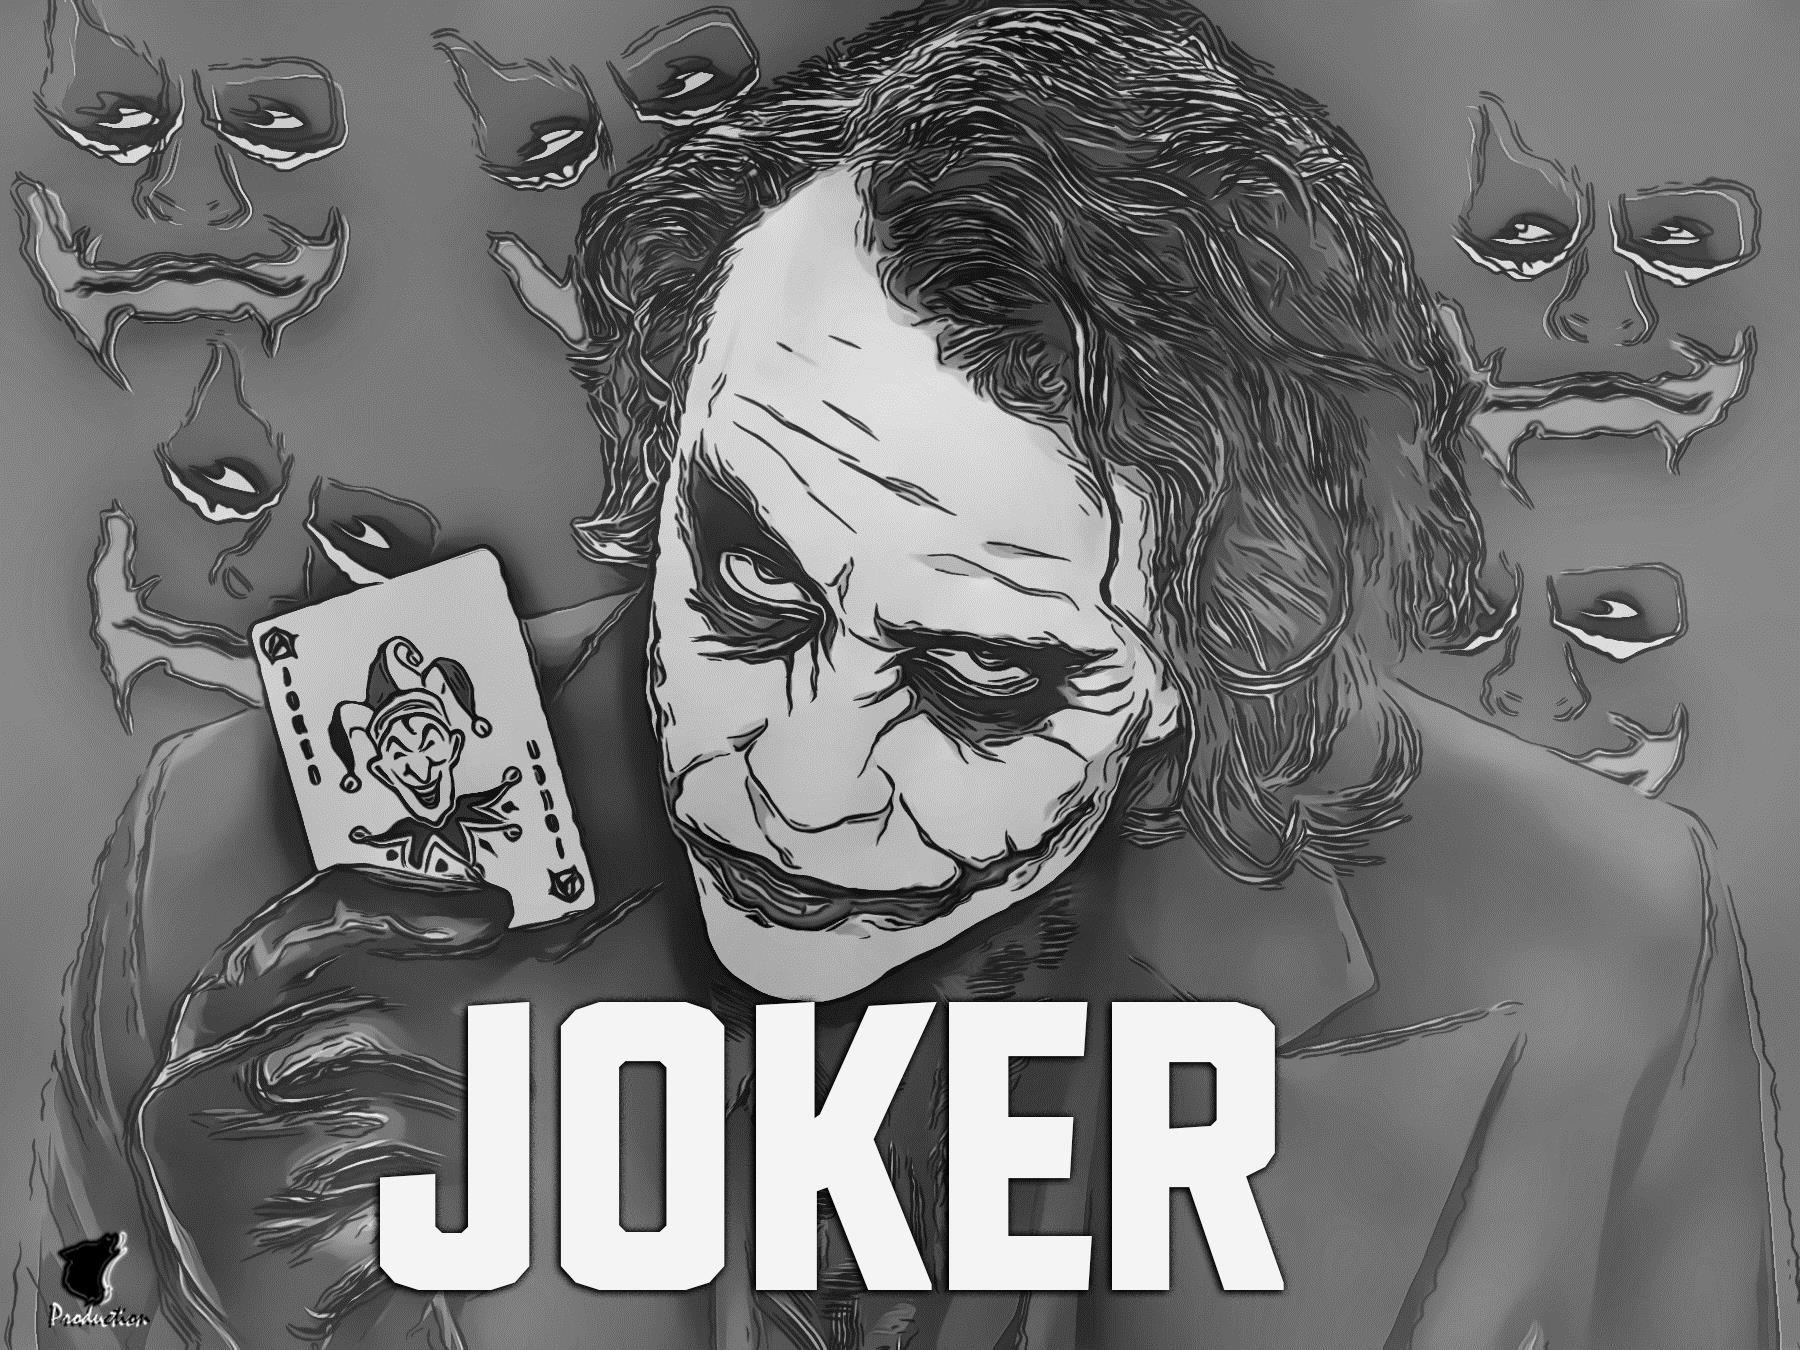 Joker Wallpaper Movie Wolf Production Joker Joker